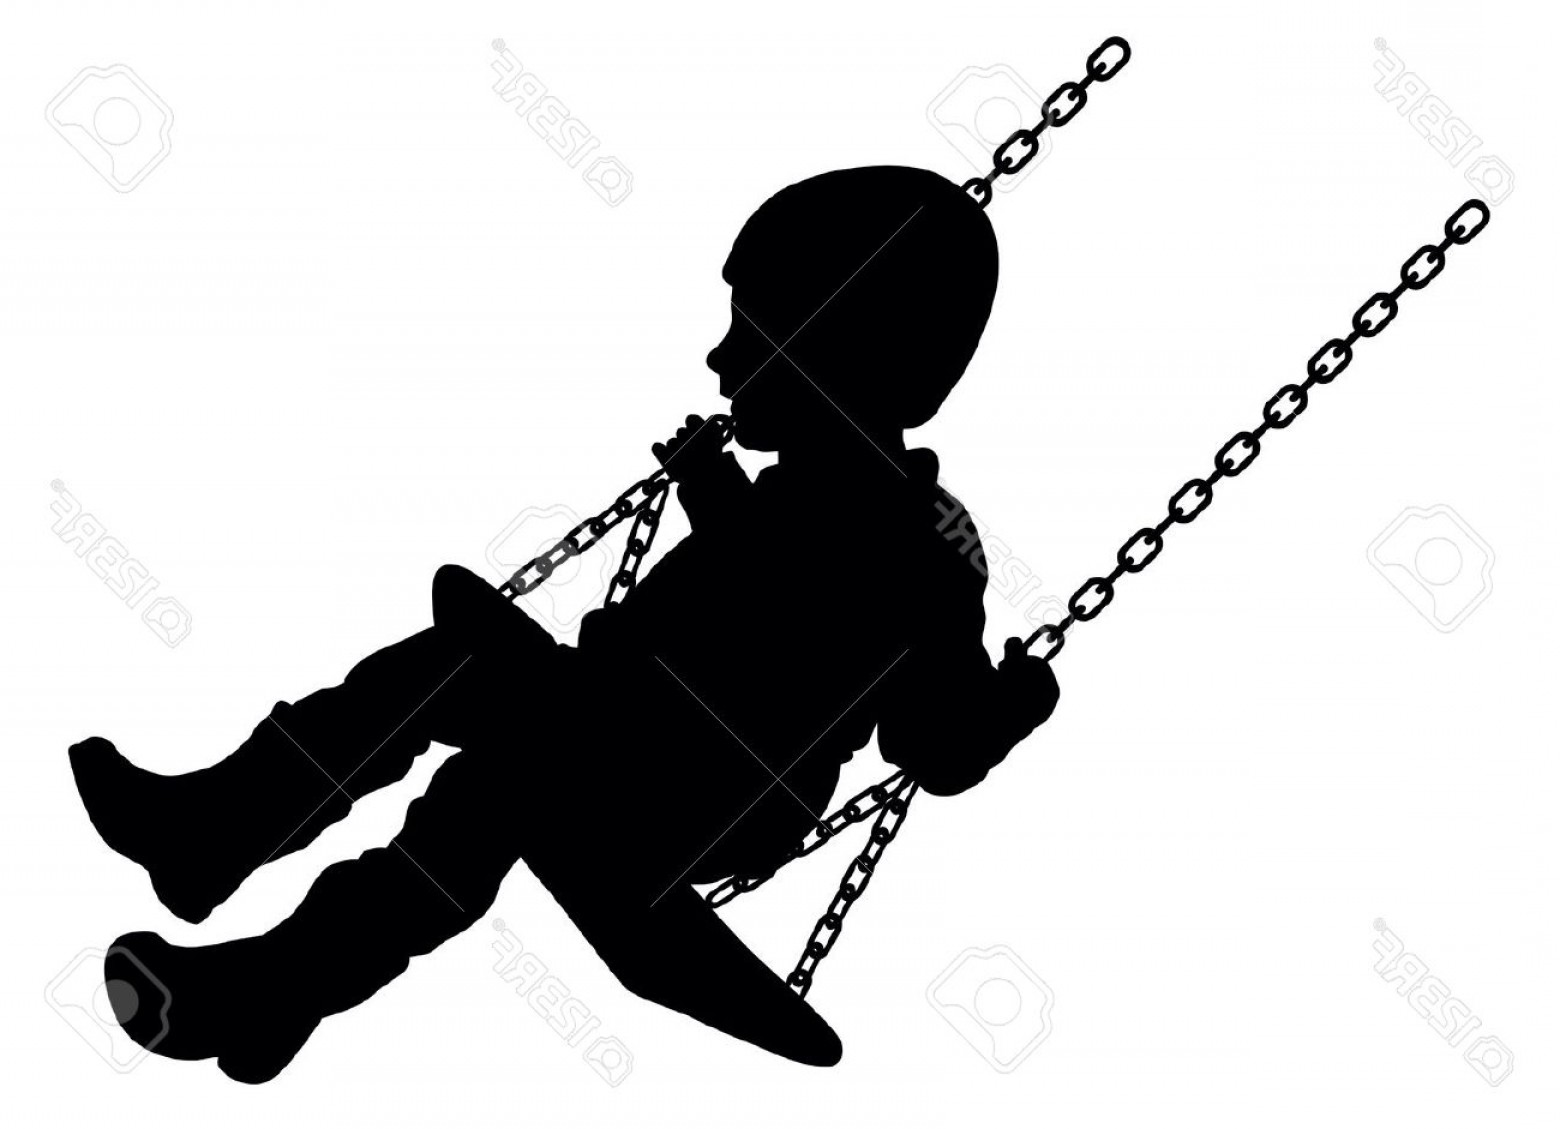 1560x1129 Swing Baby Vector Arenawp